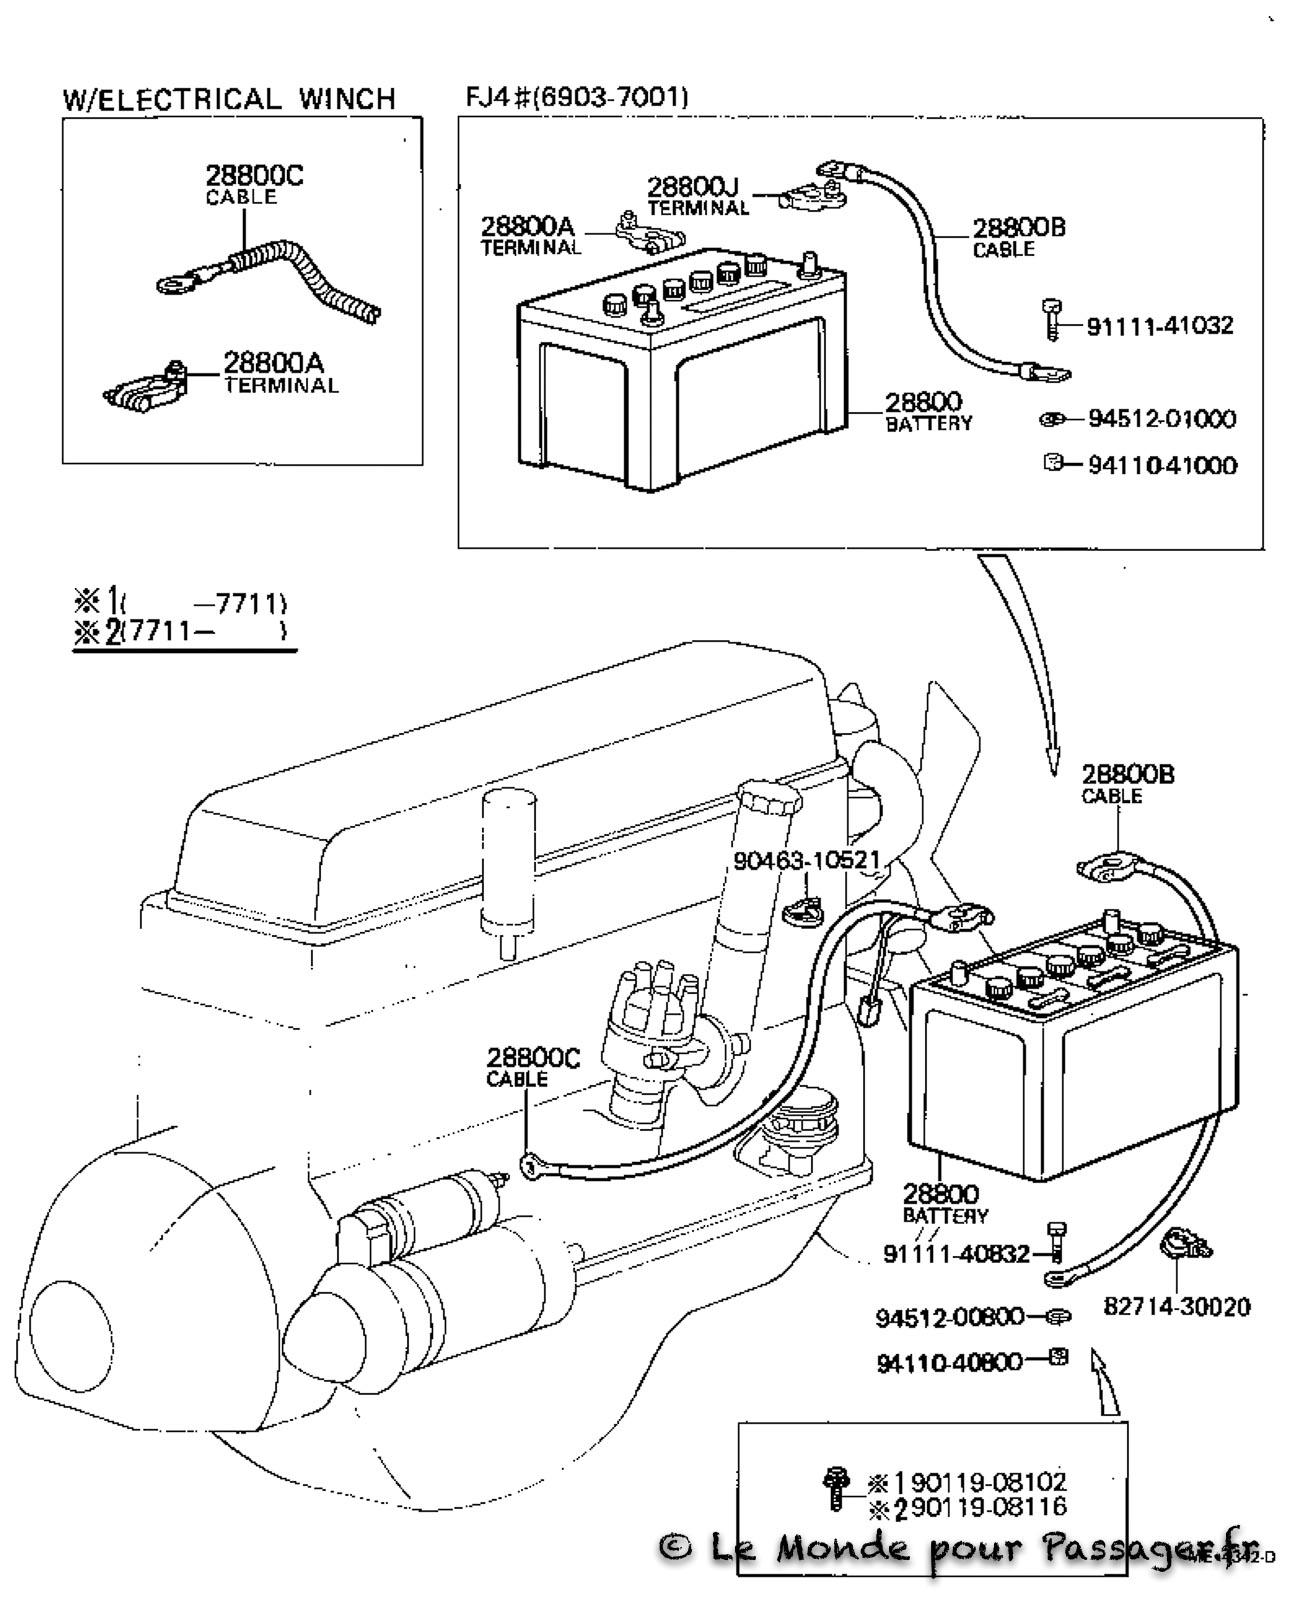 Fj55-Eclatés-Techniques024